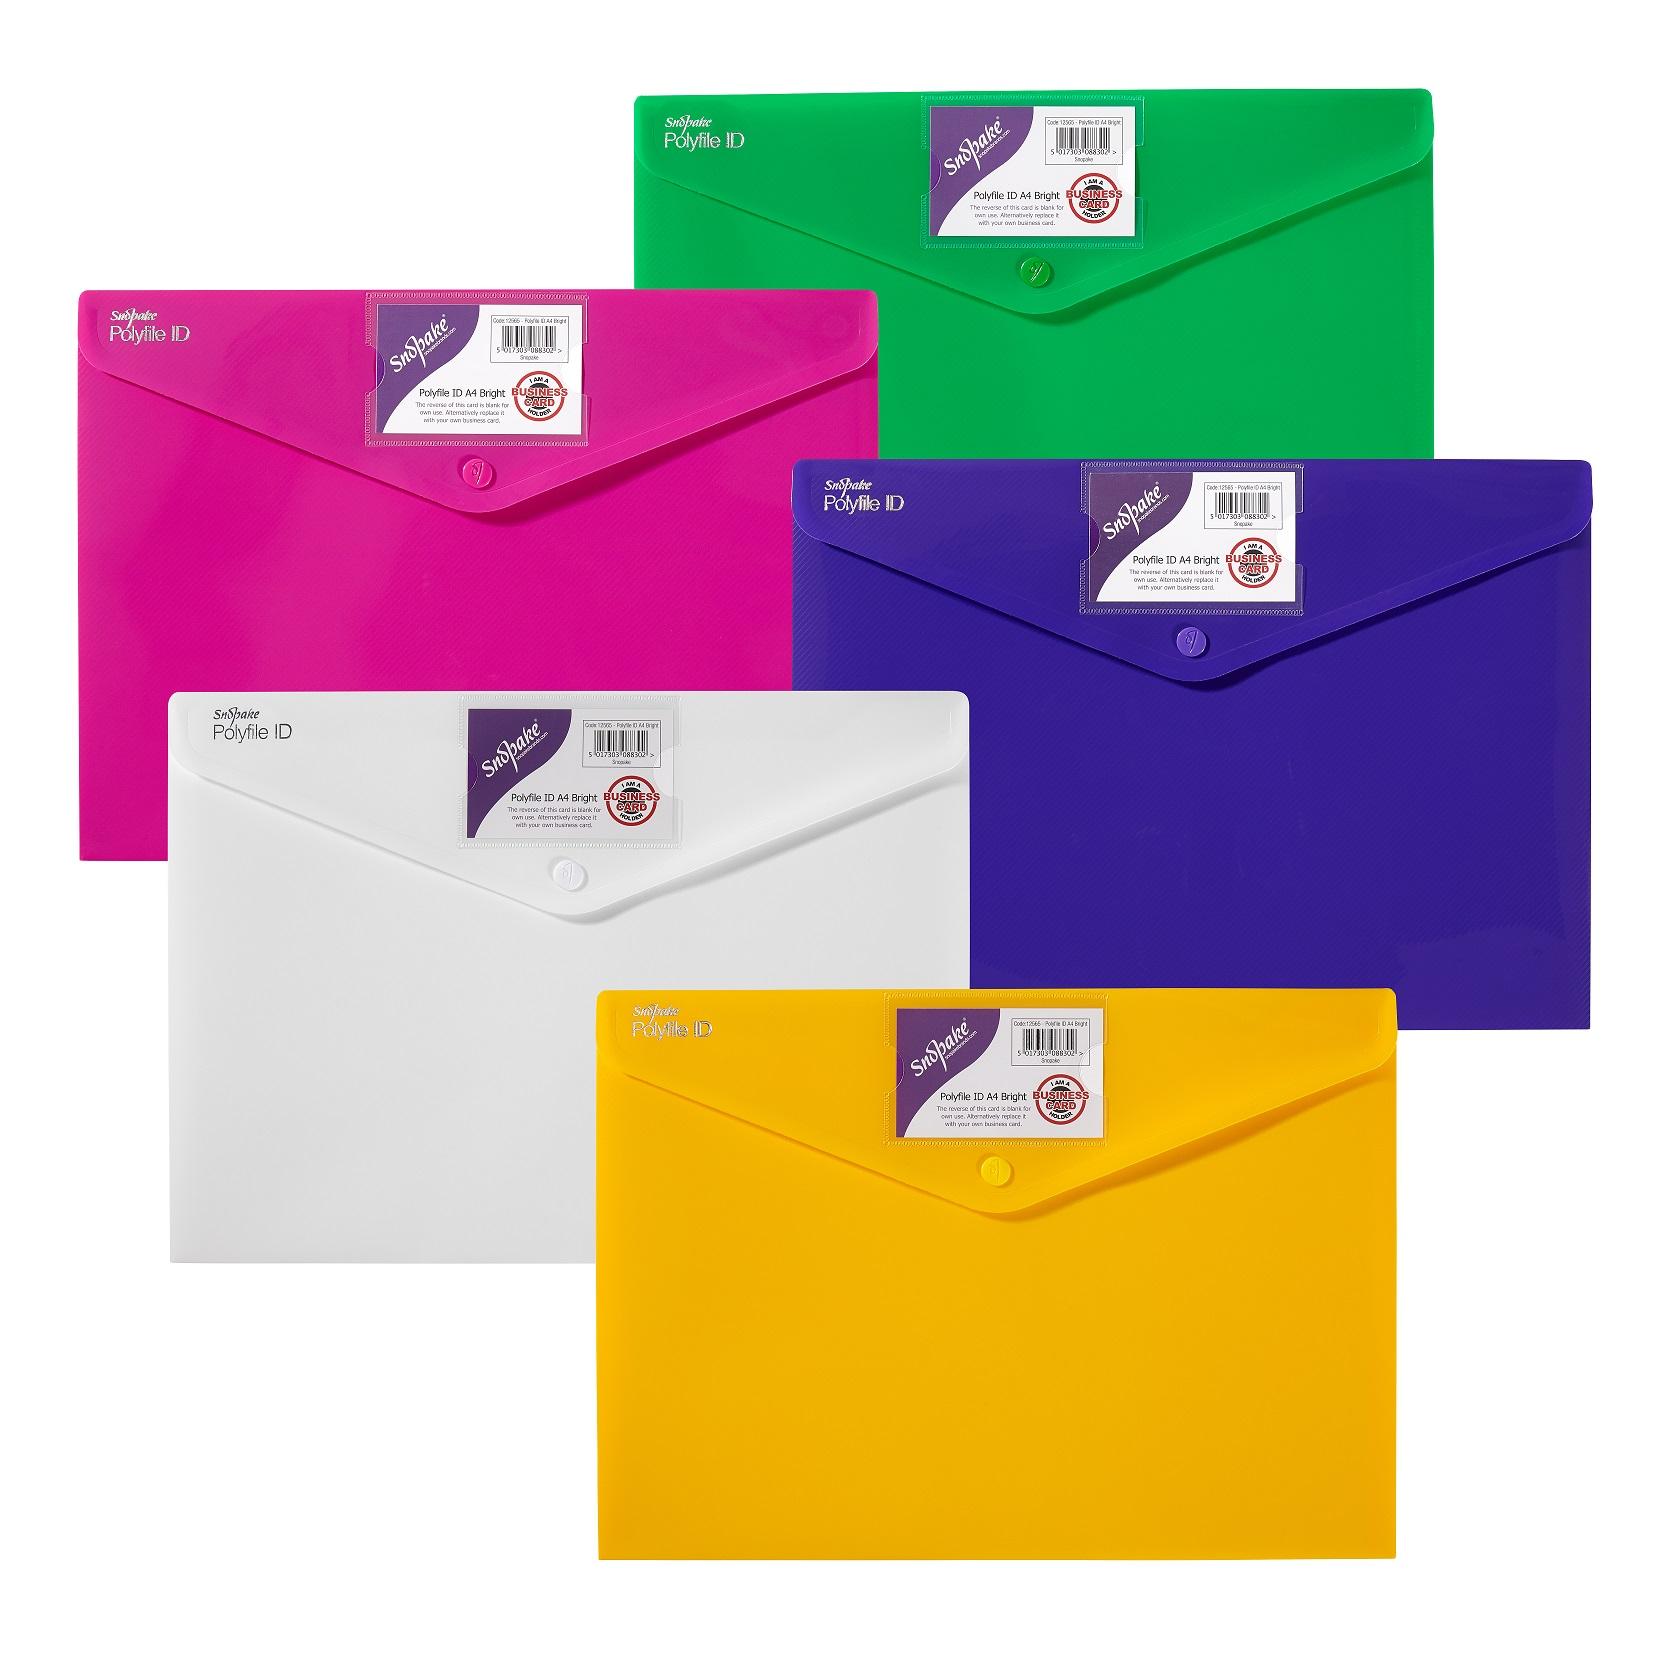 Snopake Polyfile ID Wallet File A4 Bright Astd PK5